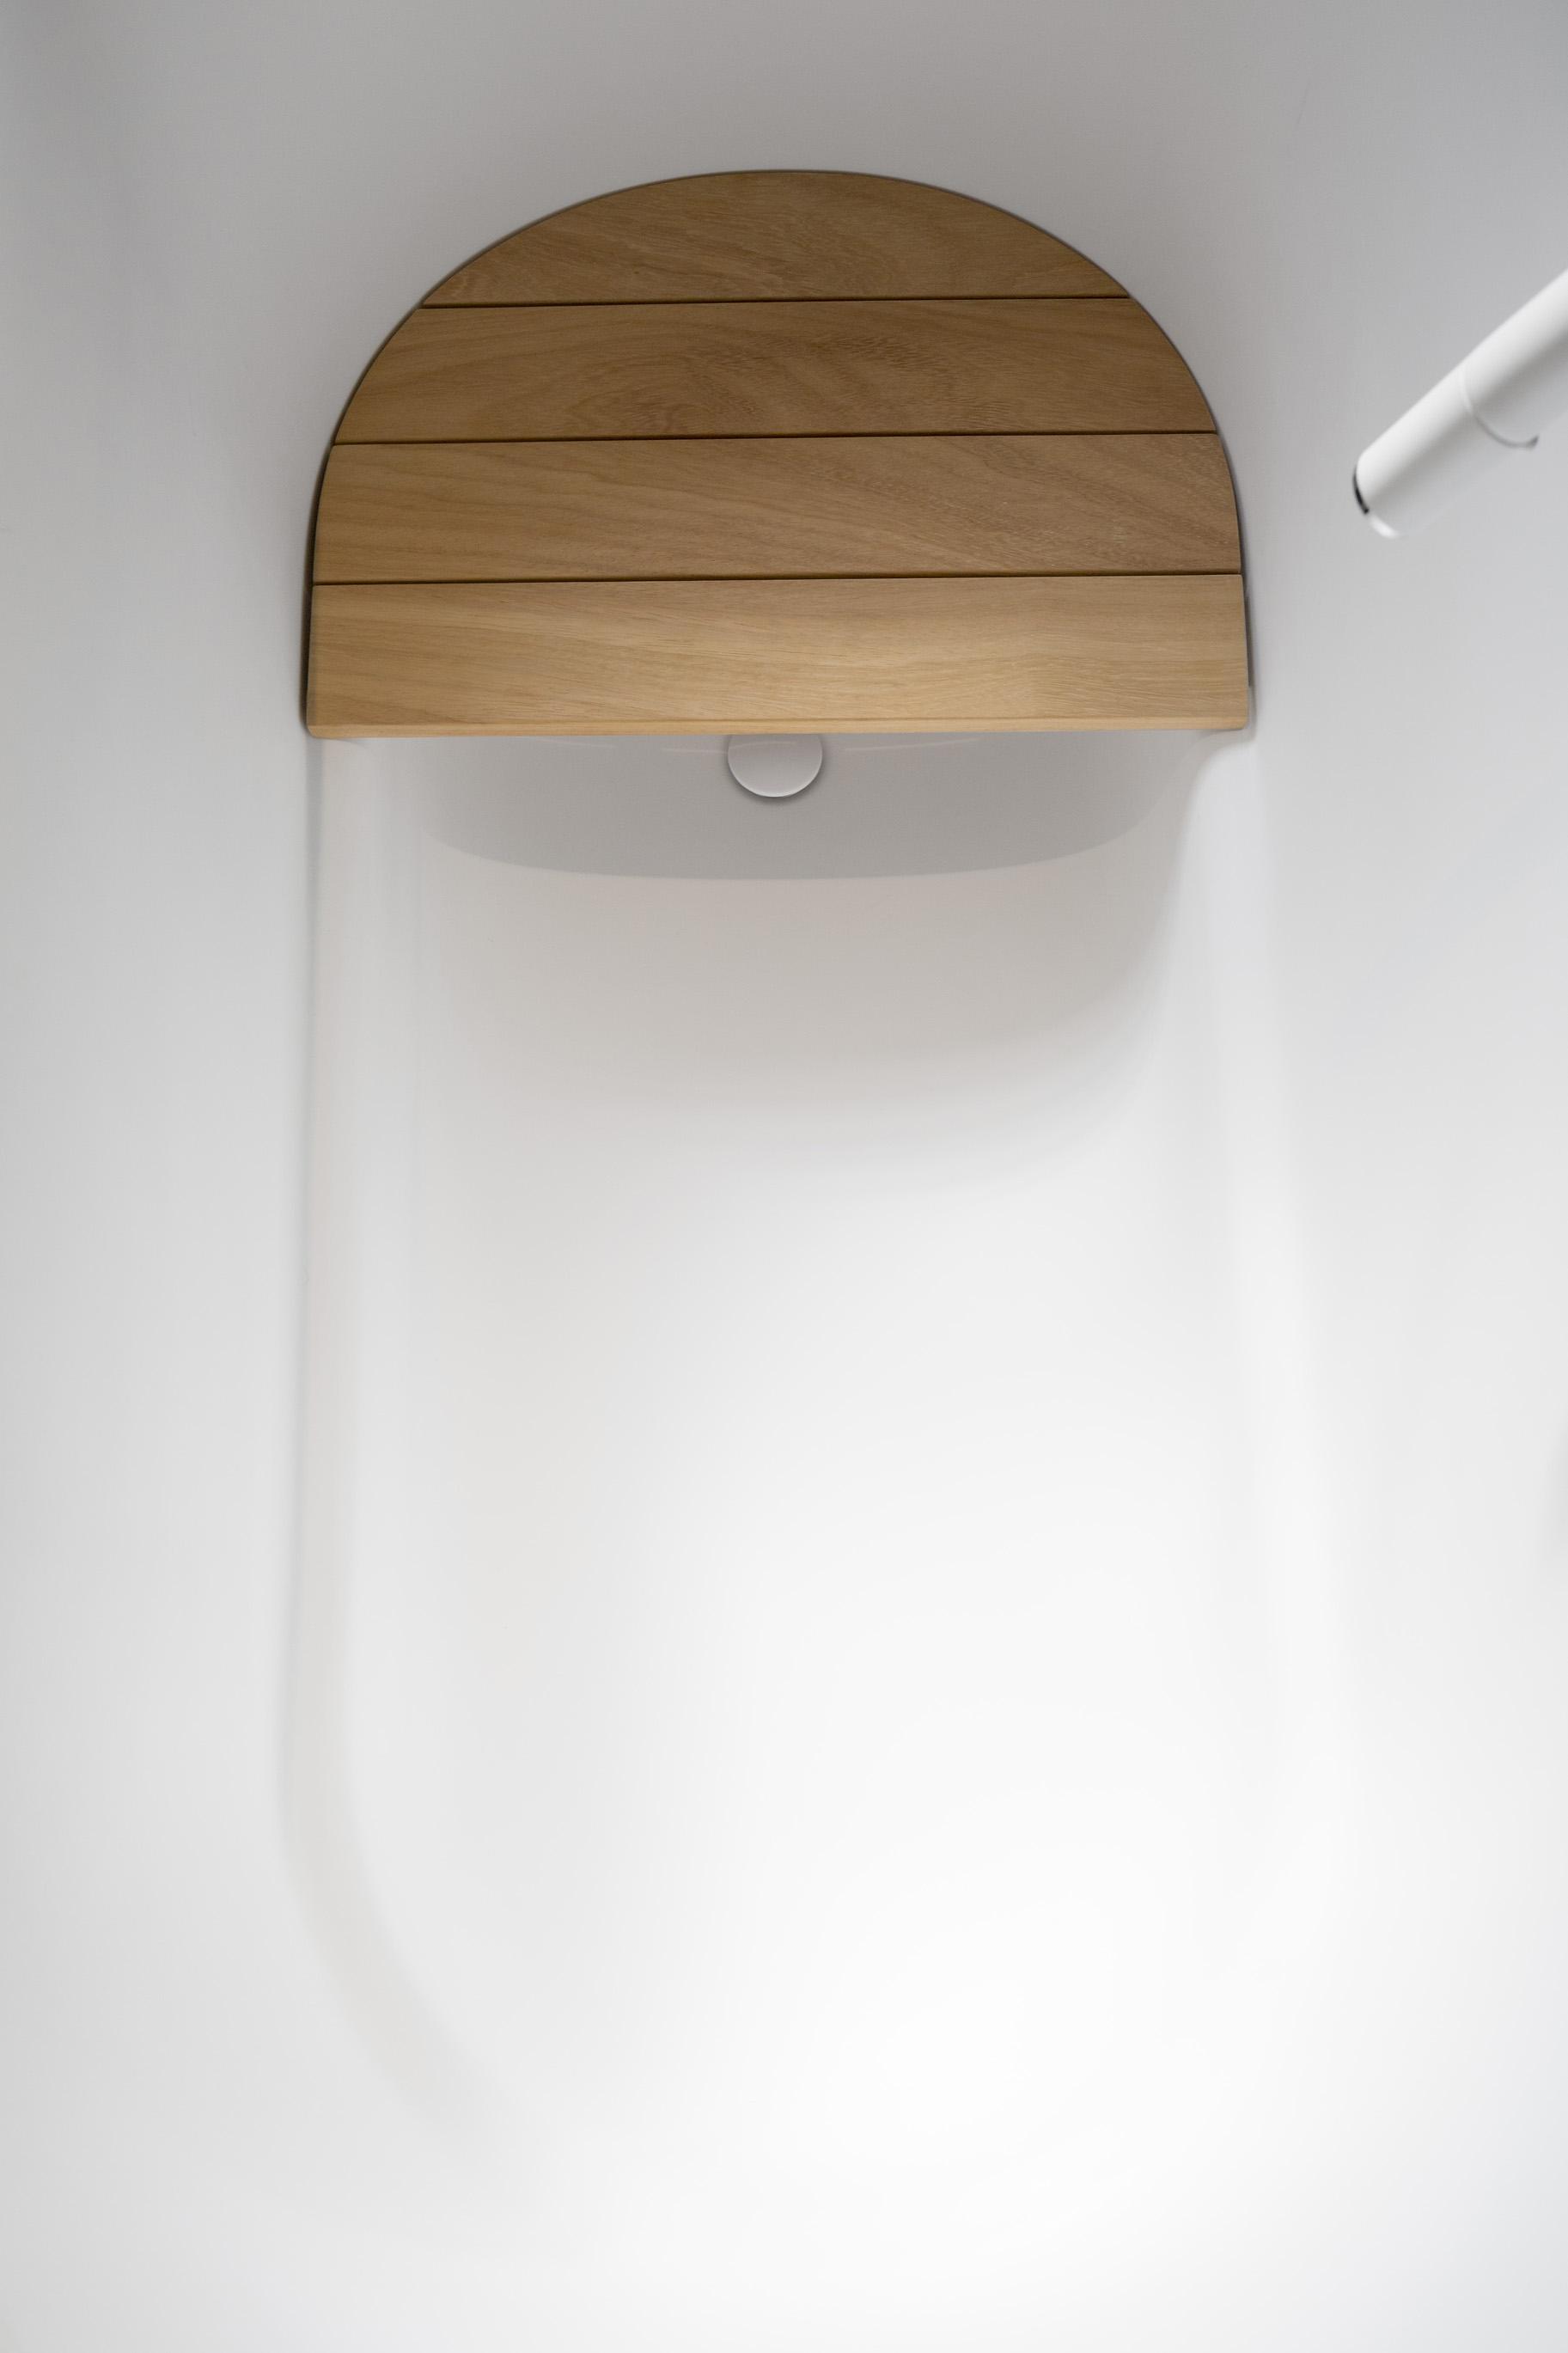 Immersion Bathtub Pedro Pegenaute